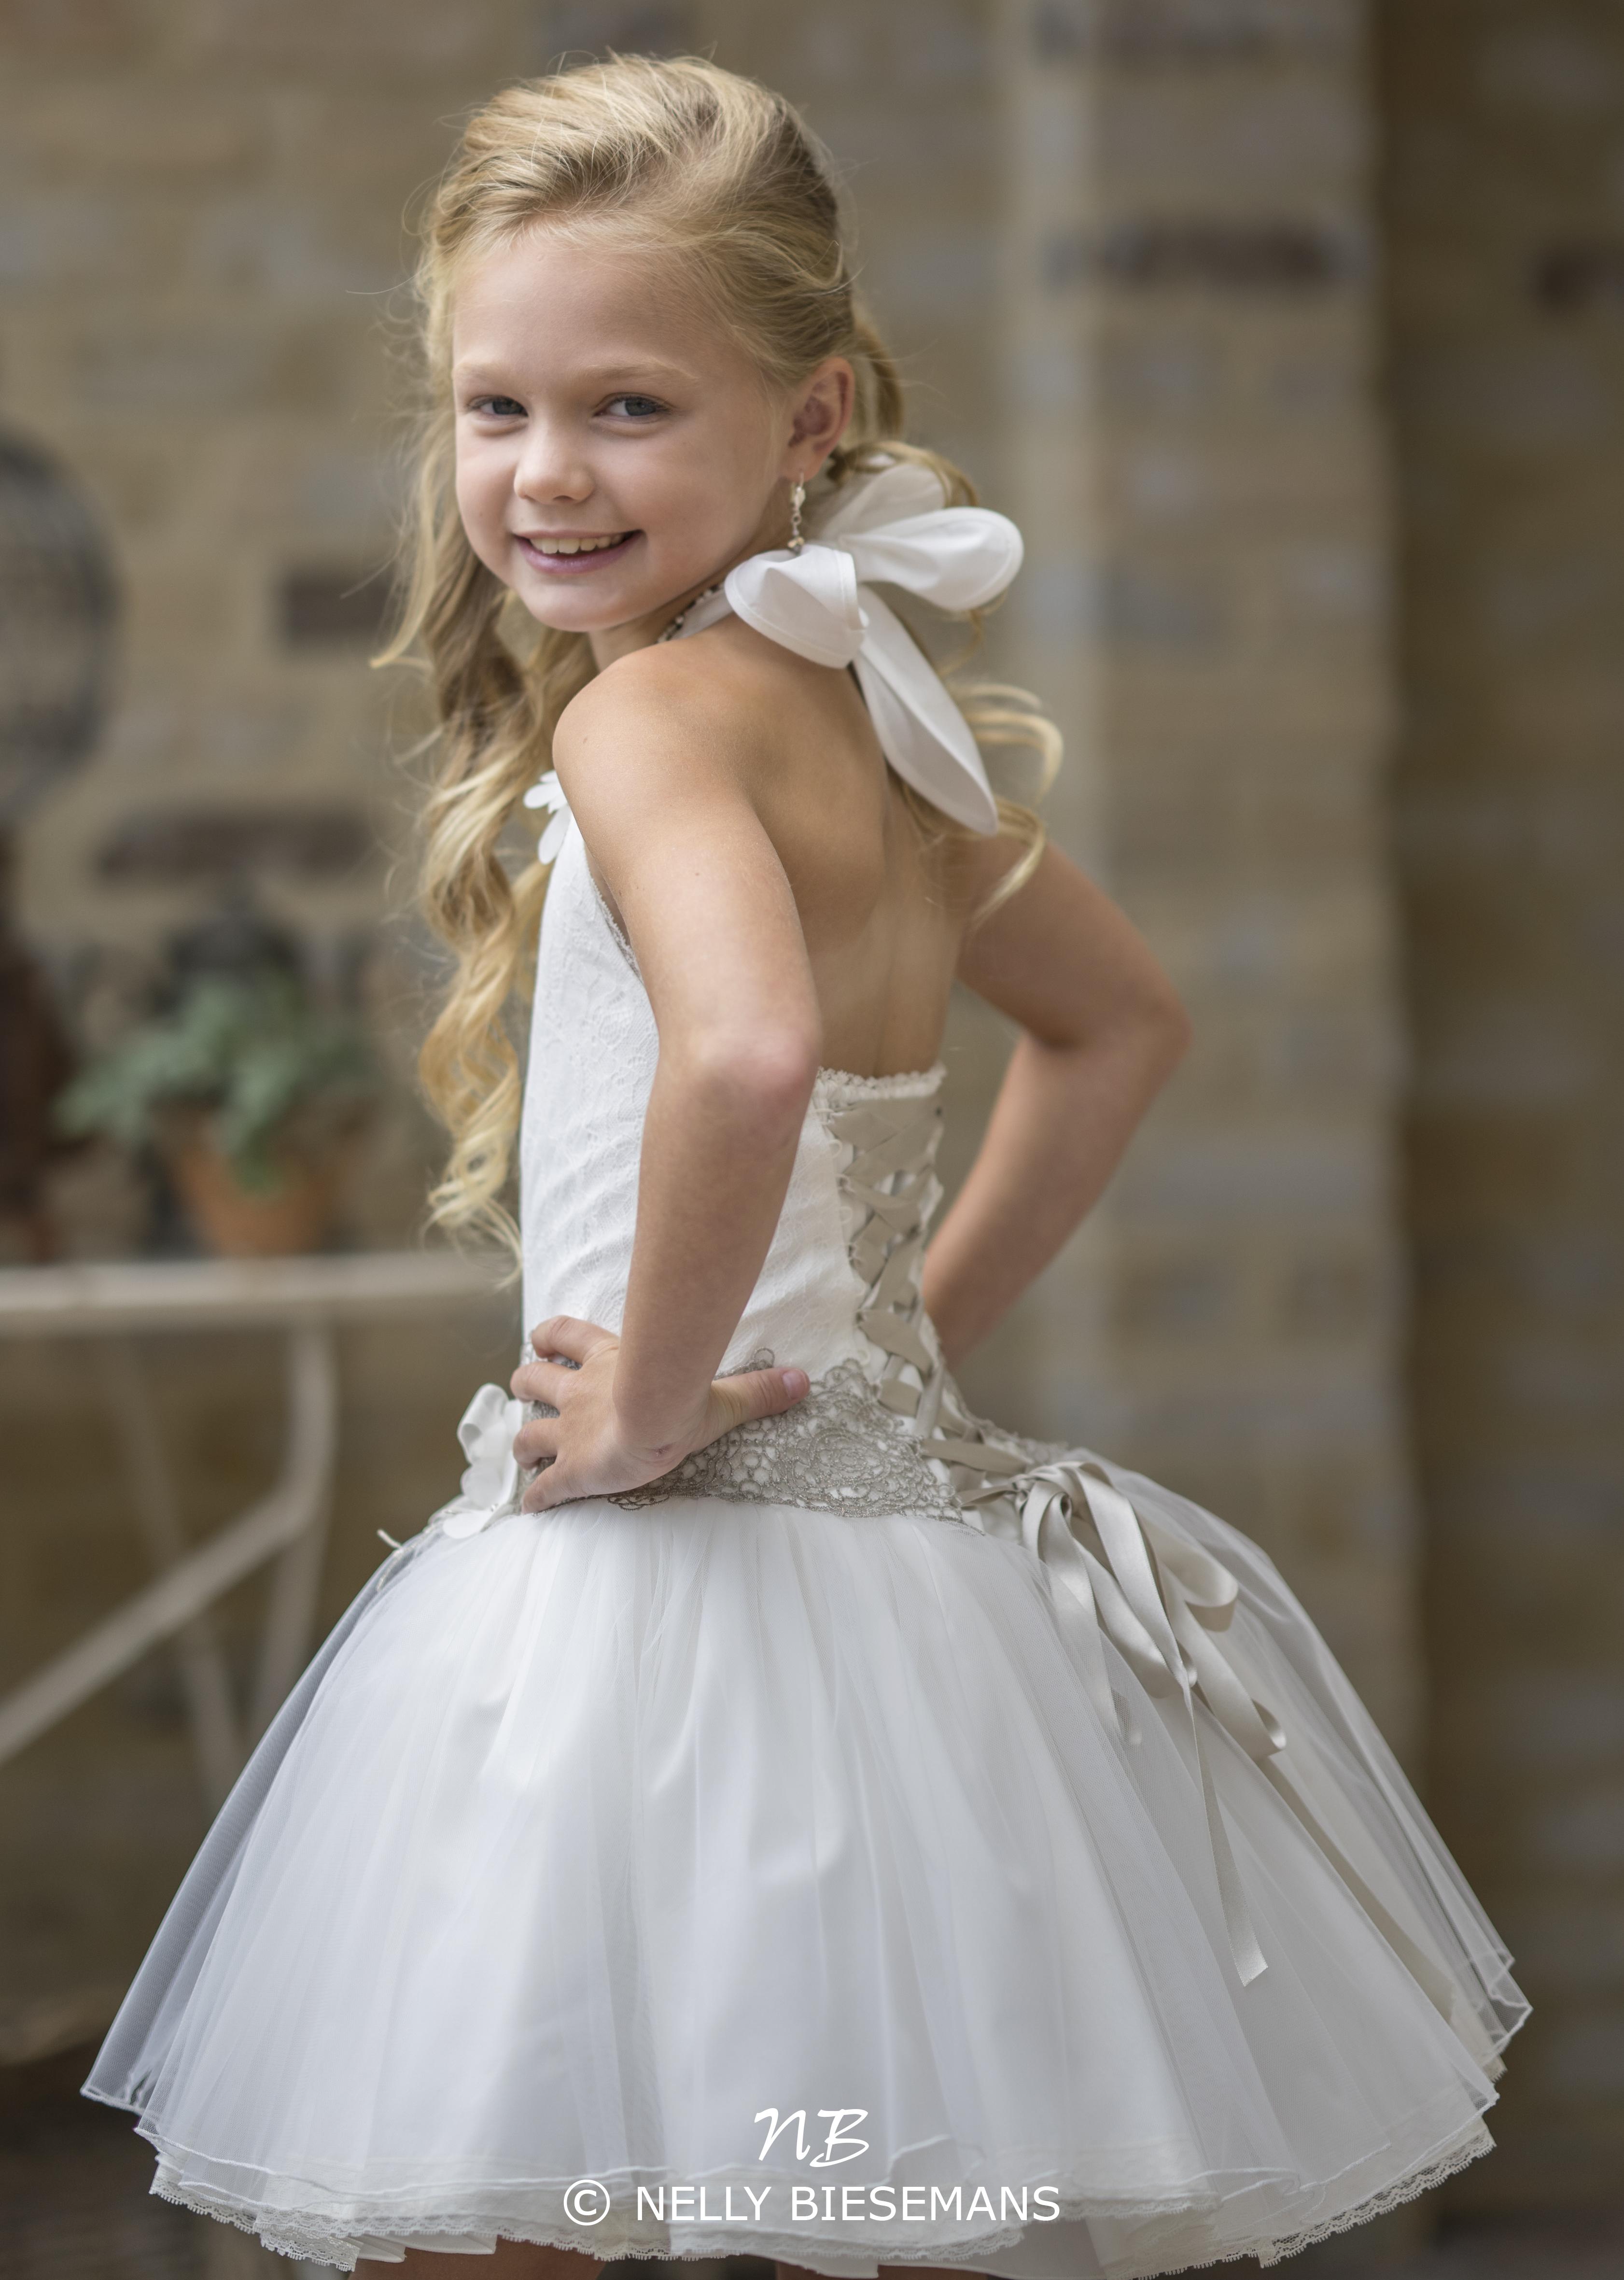 exclusieve communiejurk – bruidsmeisje – vormsel – Nelly Biesemans – www.nb4kids.com – A19K15(2)